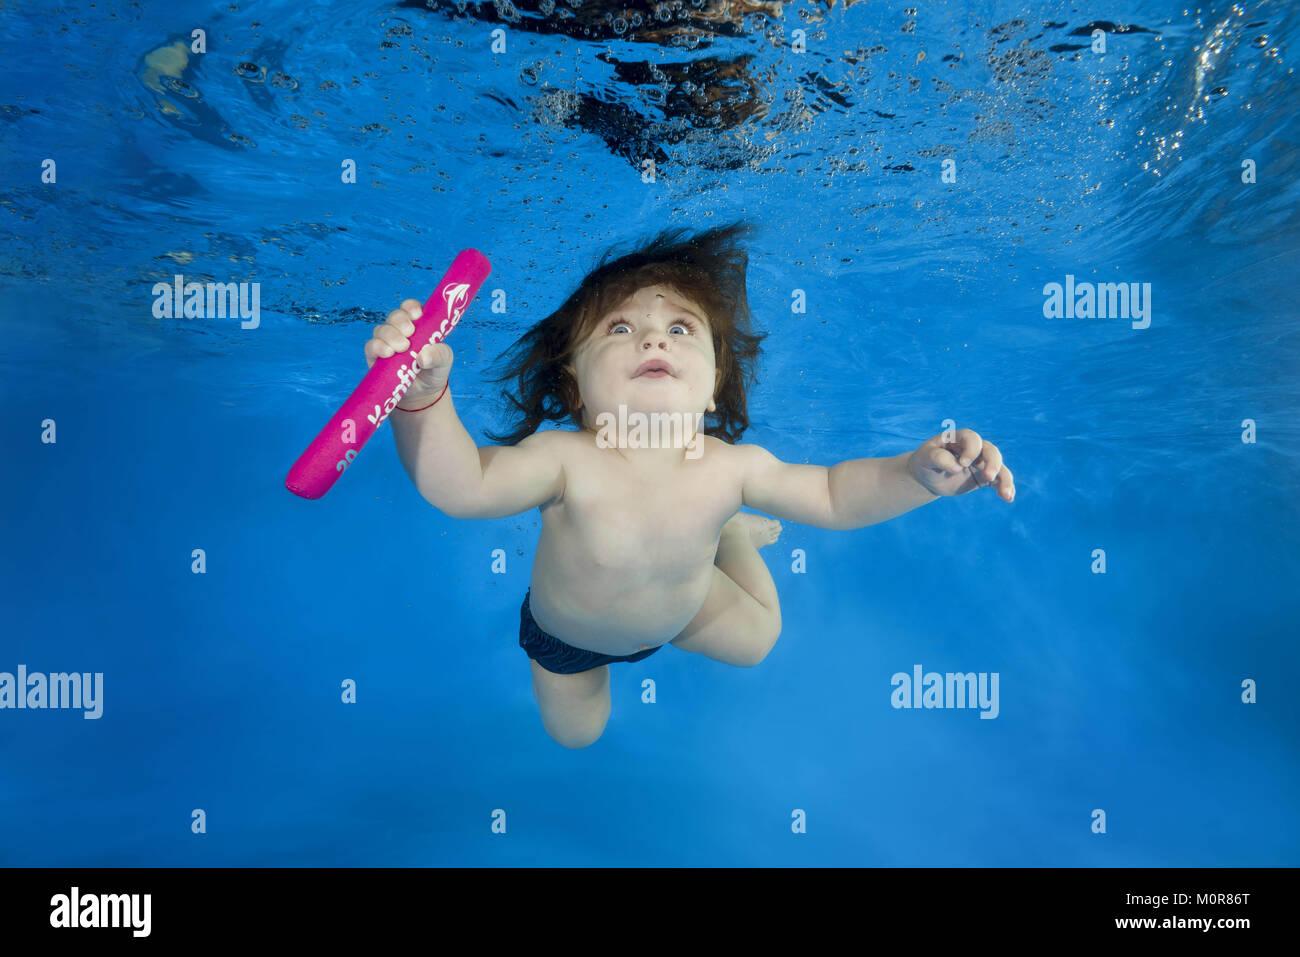 Odessa, Ukraine. 20th Jan, 2018. little boy learns to swim underwater in the pool Credit: Andrey Nekrasov/ZUMA Wire/ZUMAPRESS.com/Alamy - Stock Image